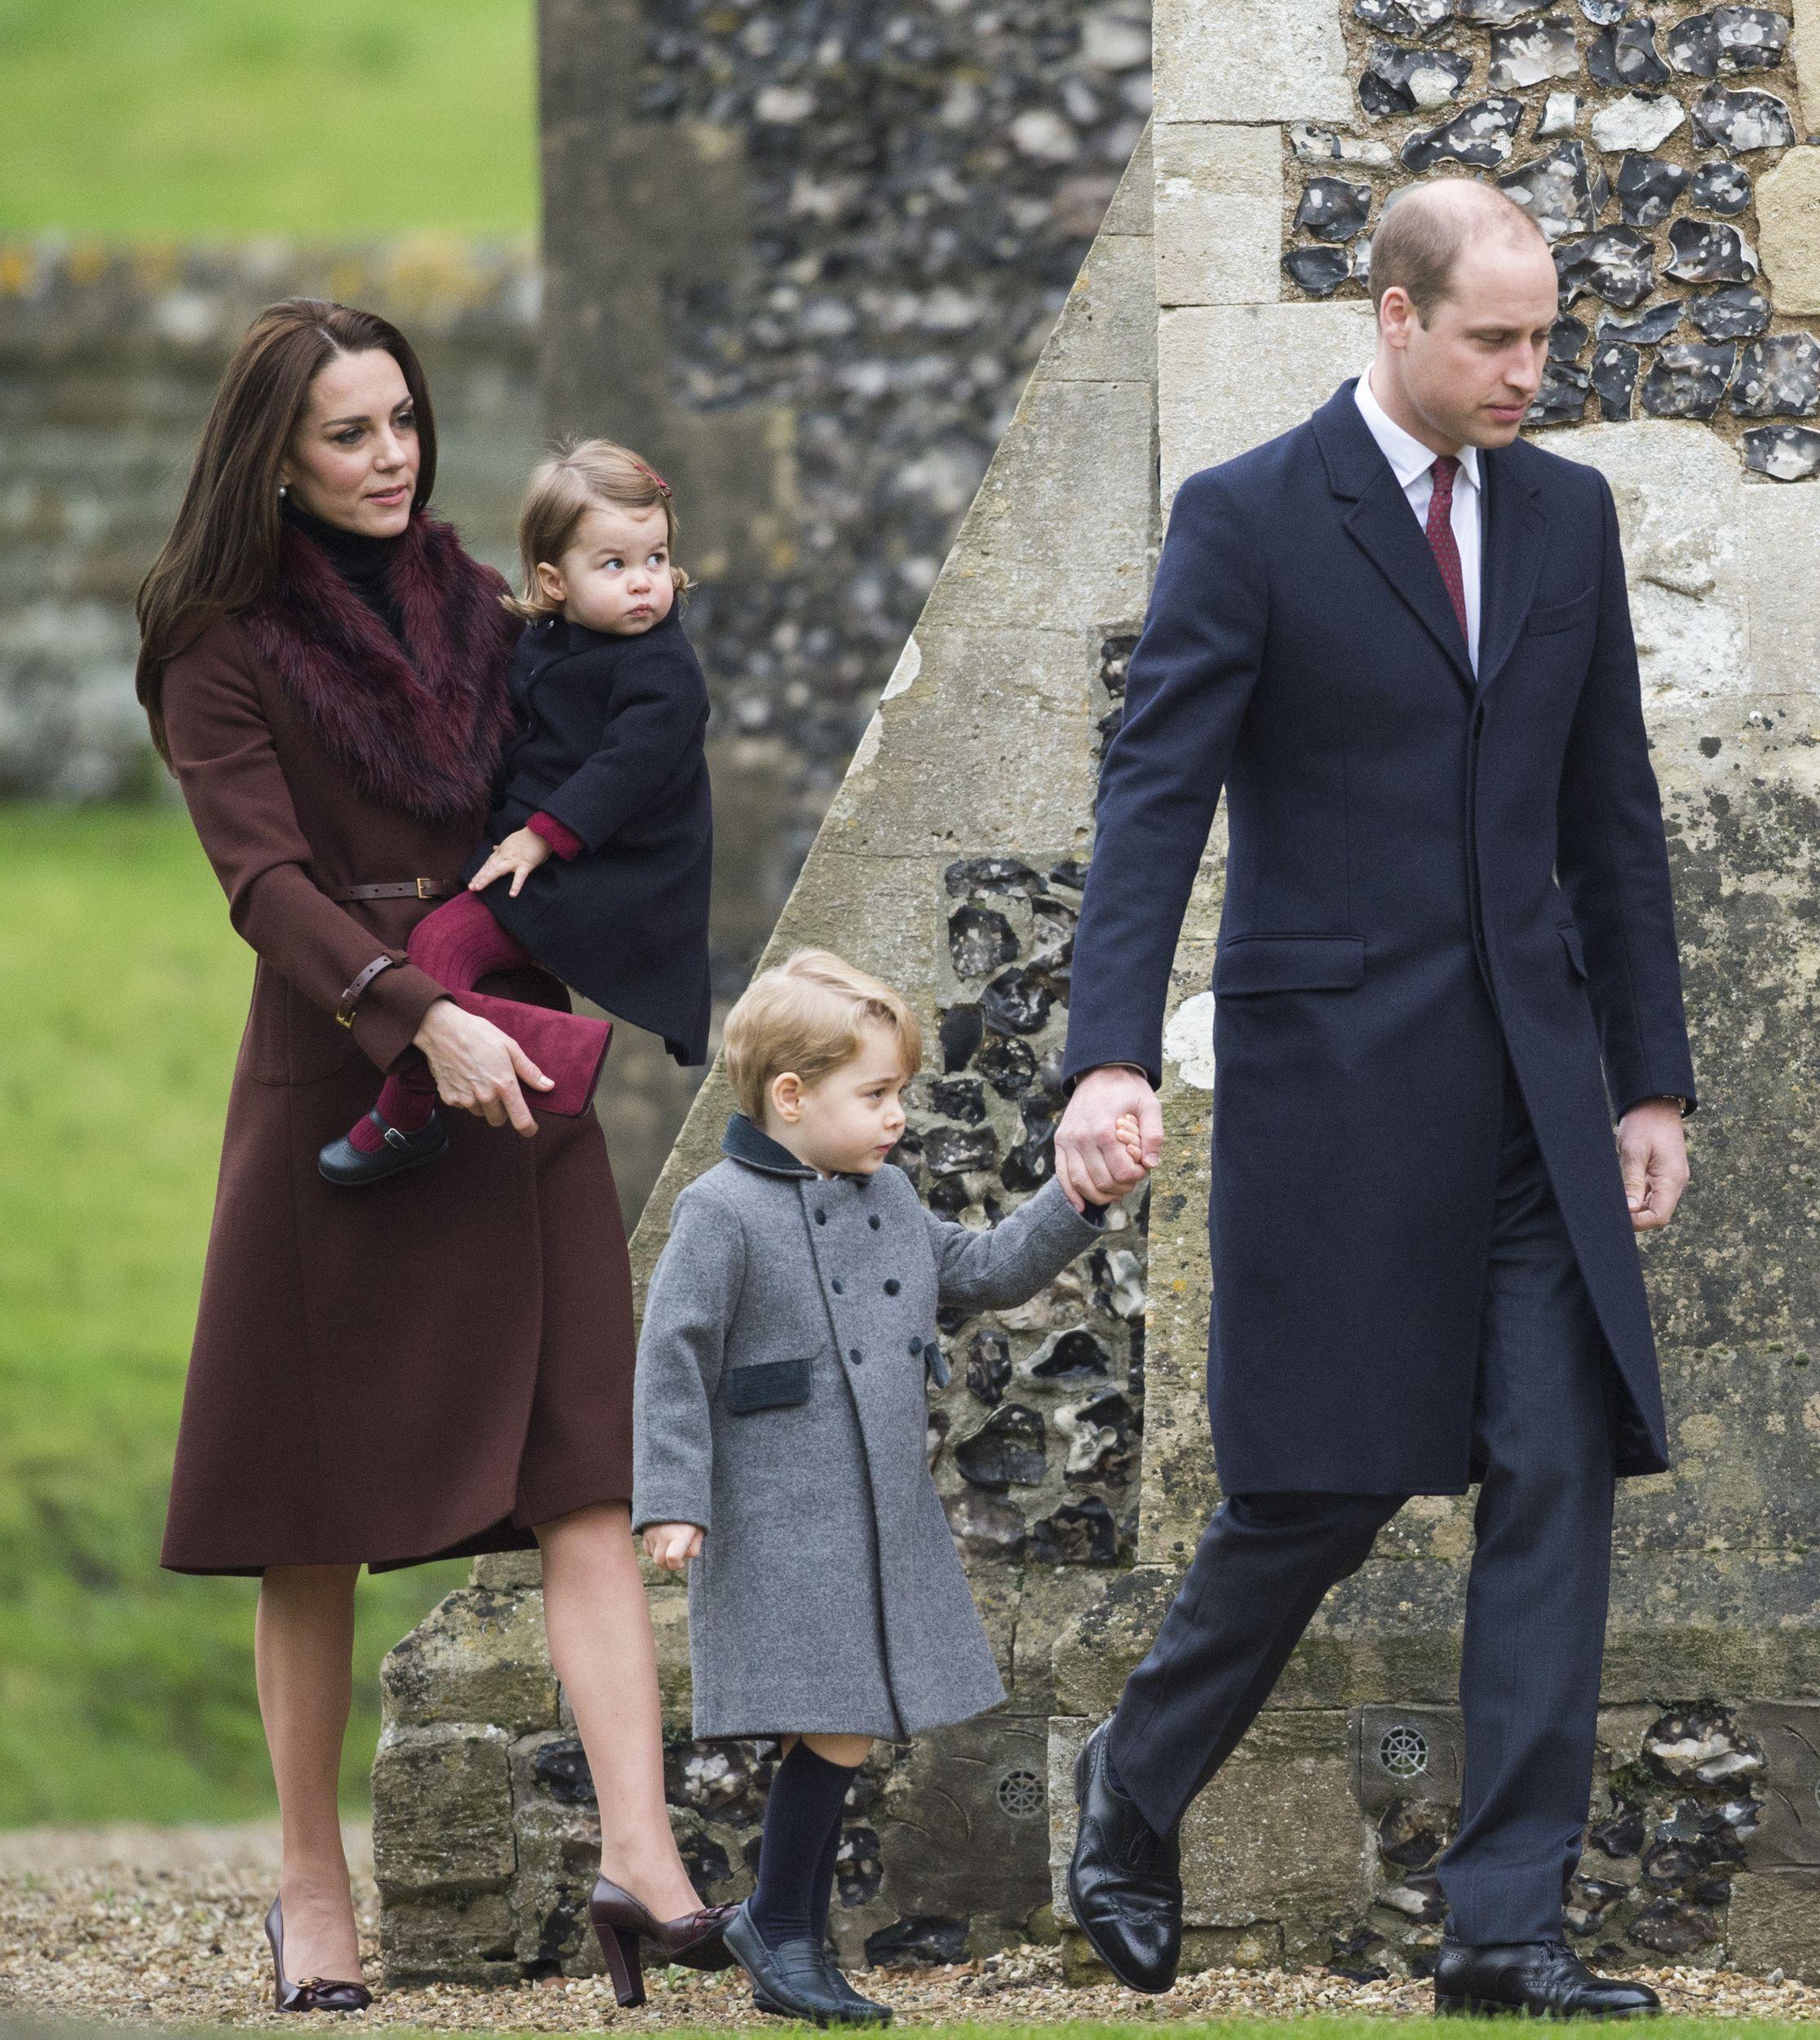 Bucklebury berkshire december 25 prince william duke of cambridge catherine